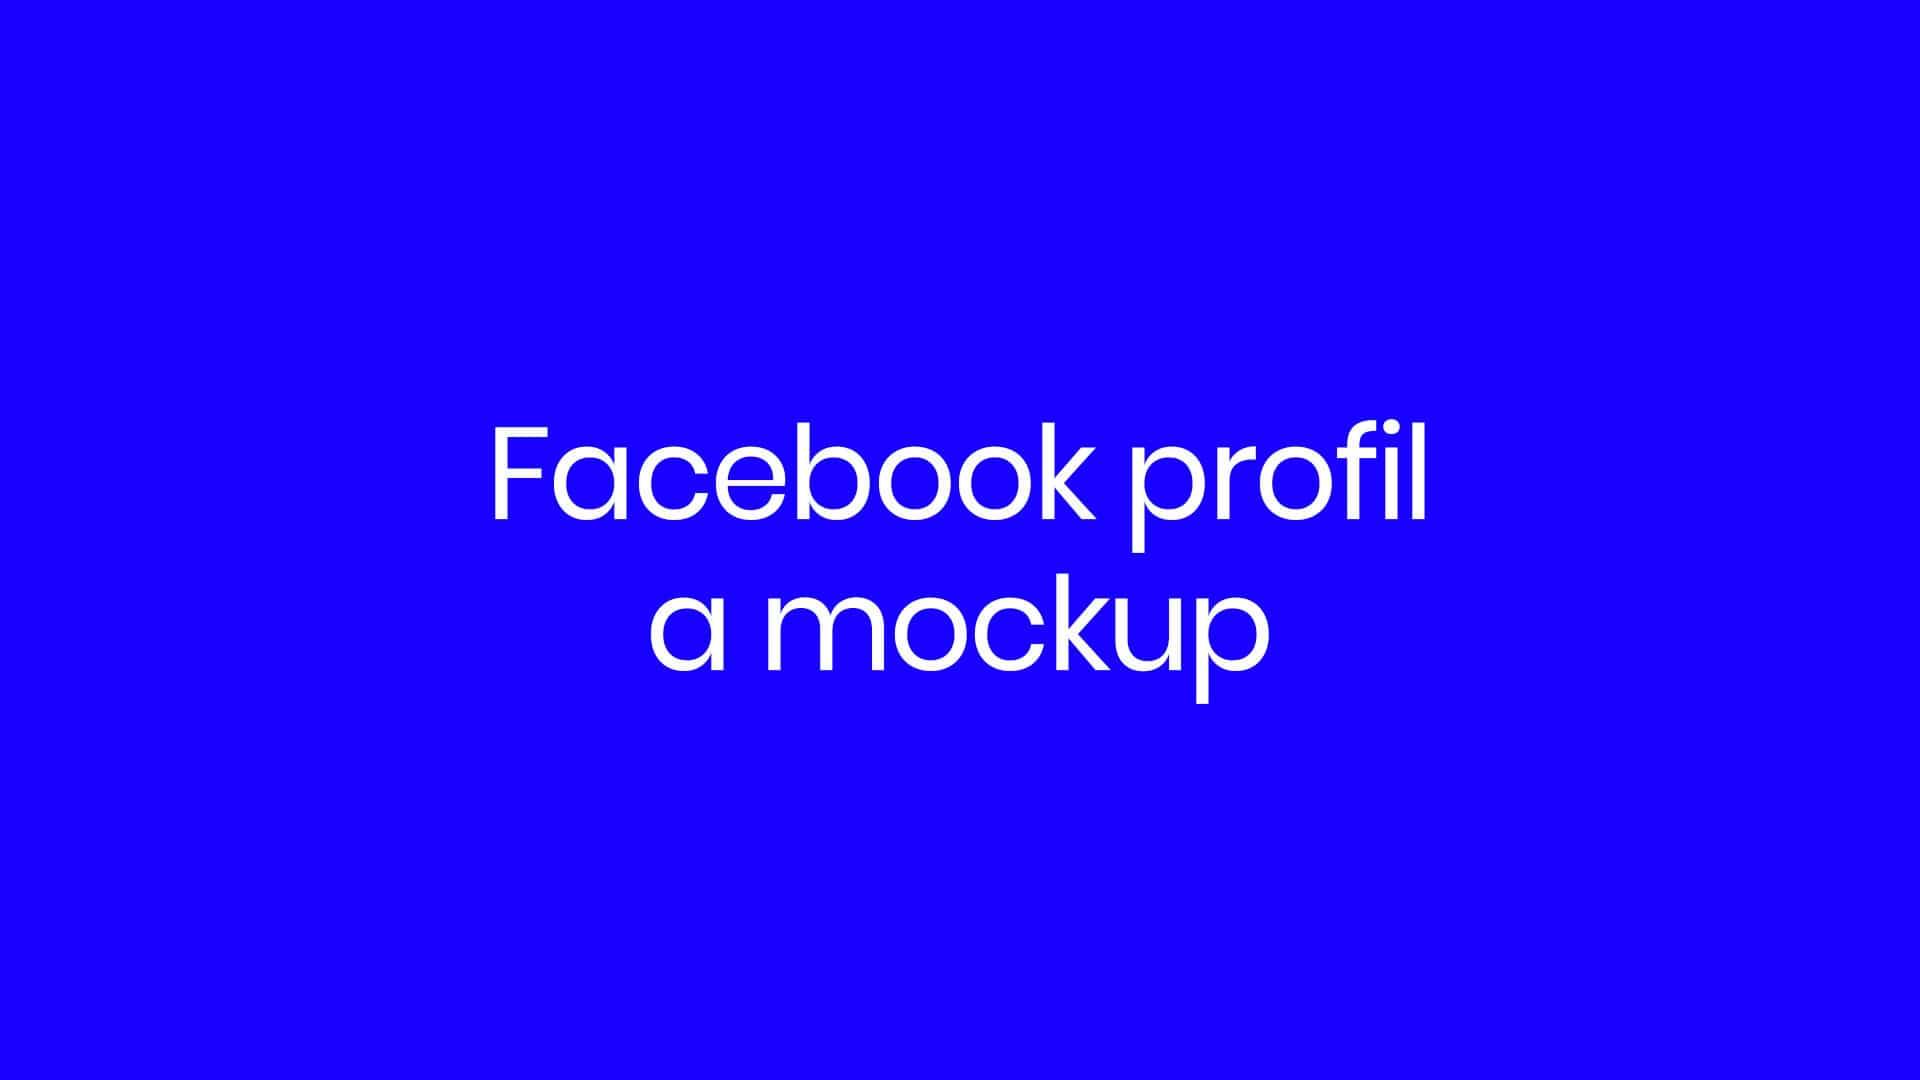 20. díl - Facebook profil amockup